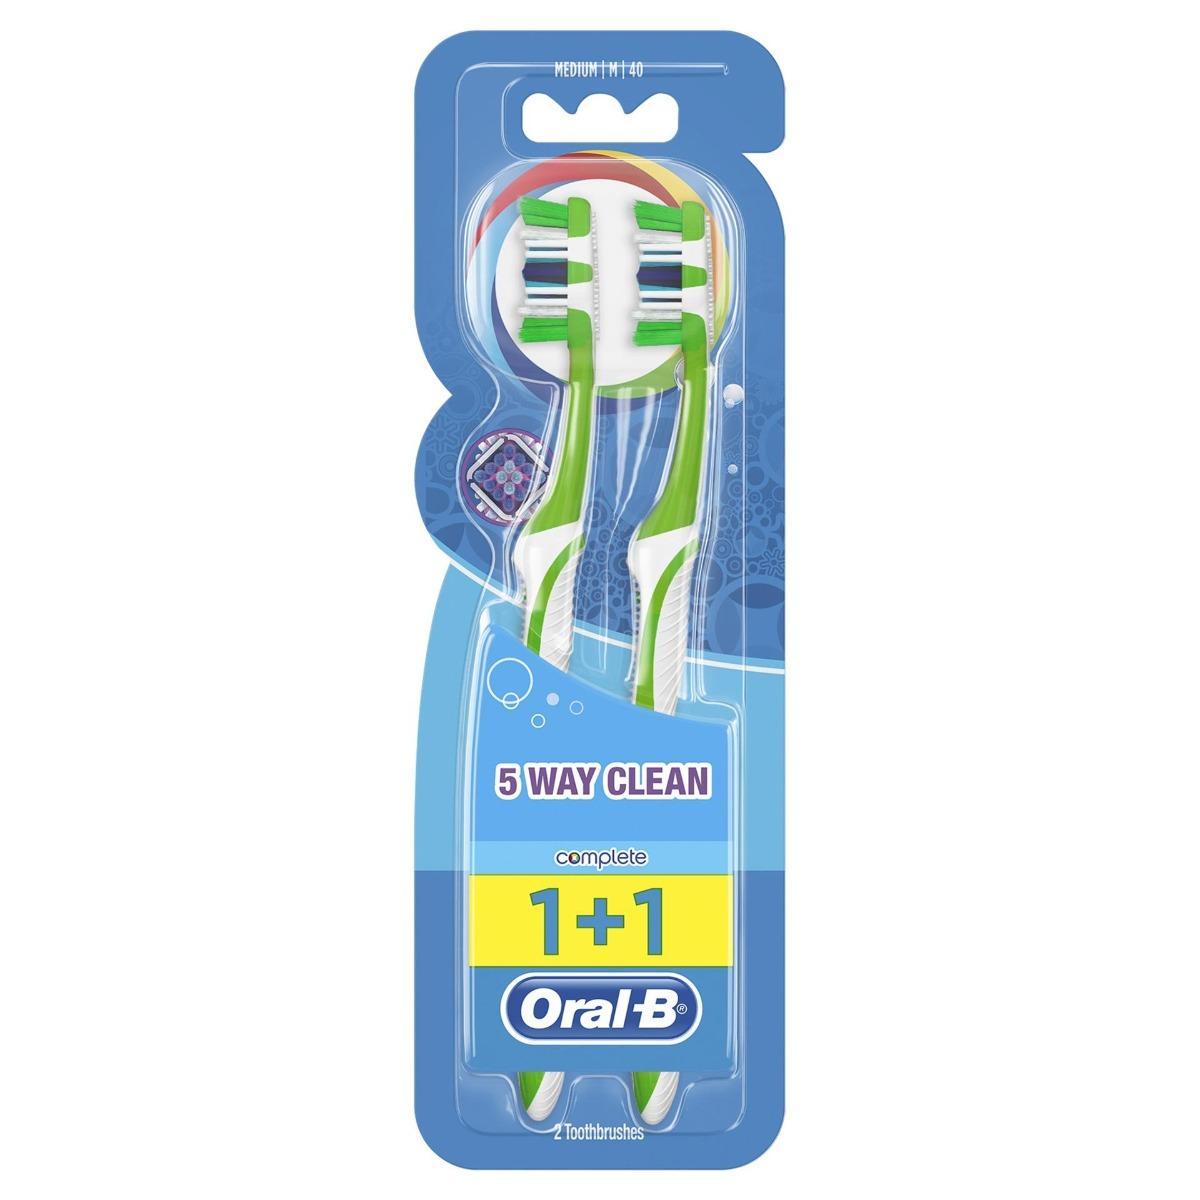 Periuta de dinti Complete 5Way Clean 40 medium, 2 bucati, Oral-B